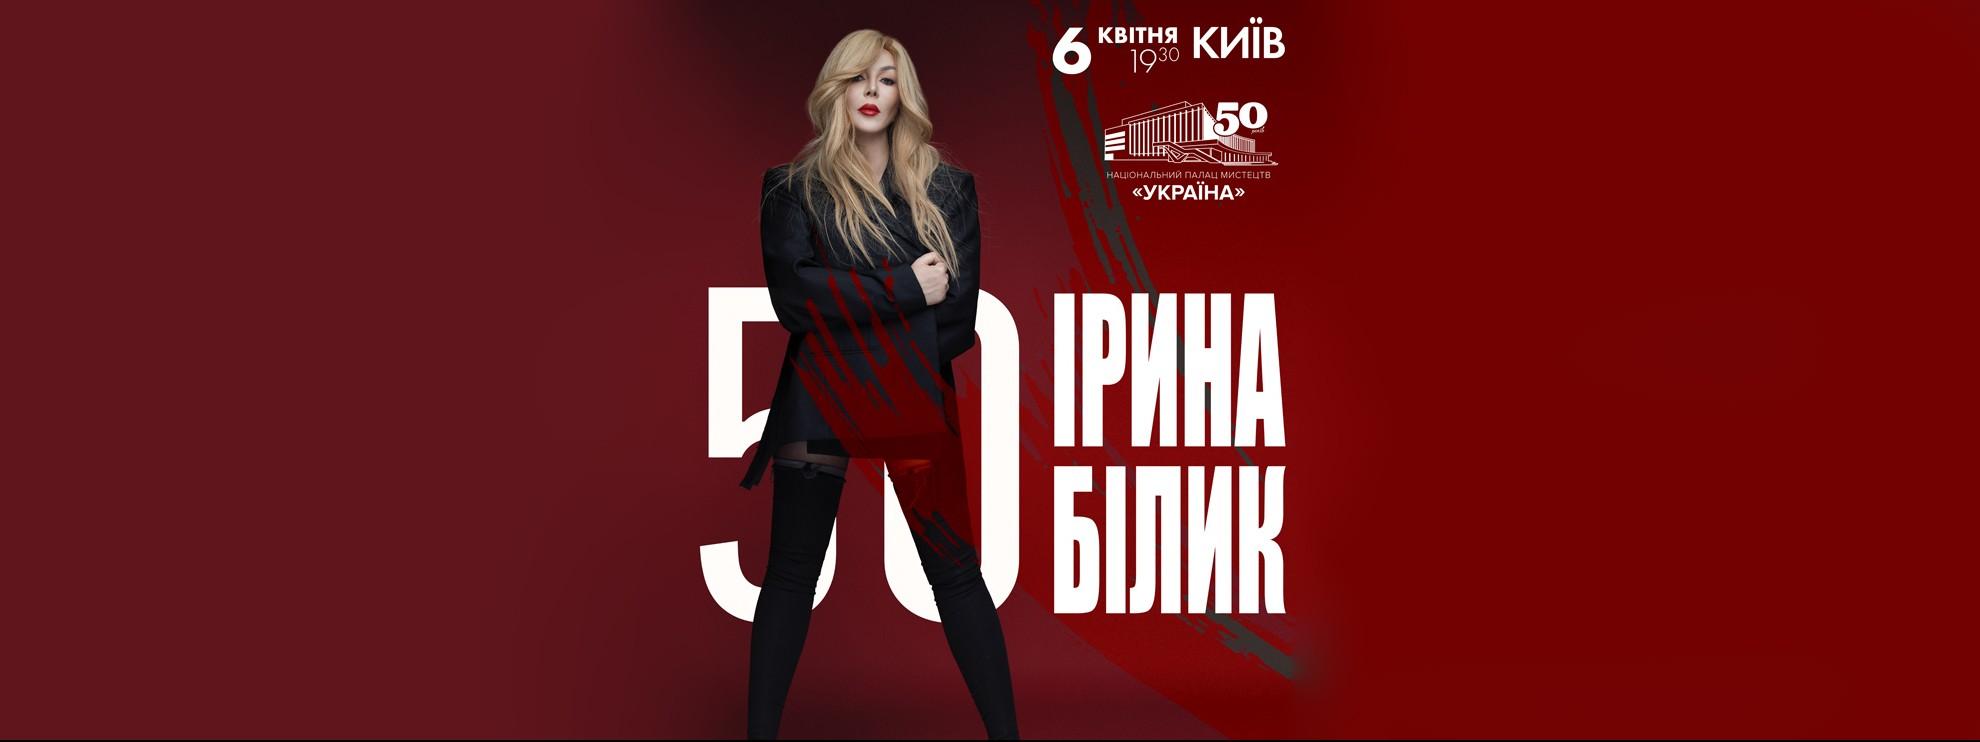 событие Ирина Билык. Юбилейный концерт. Телесъемка